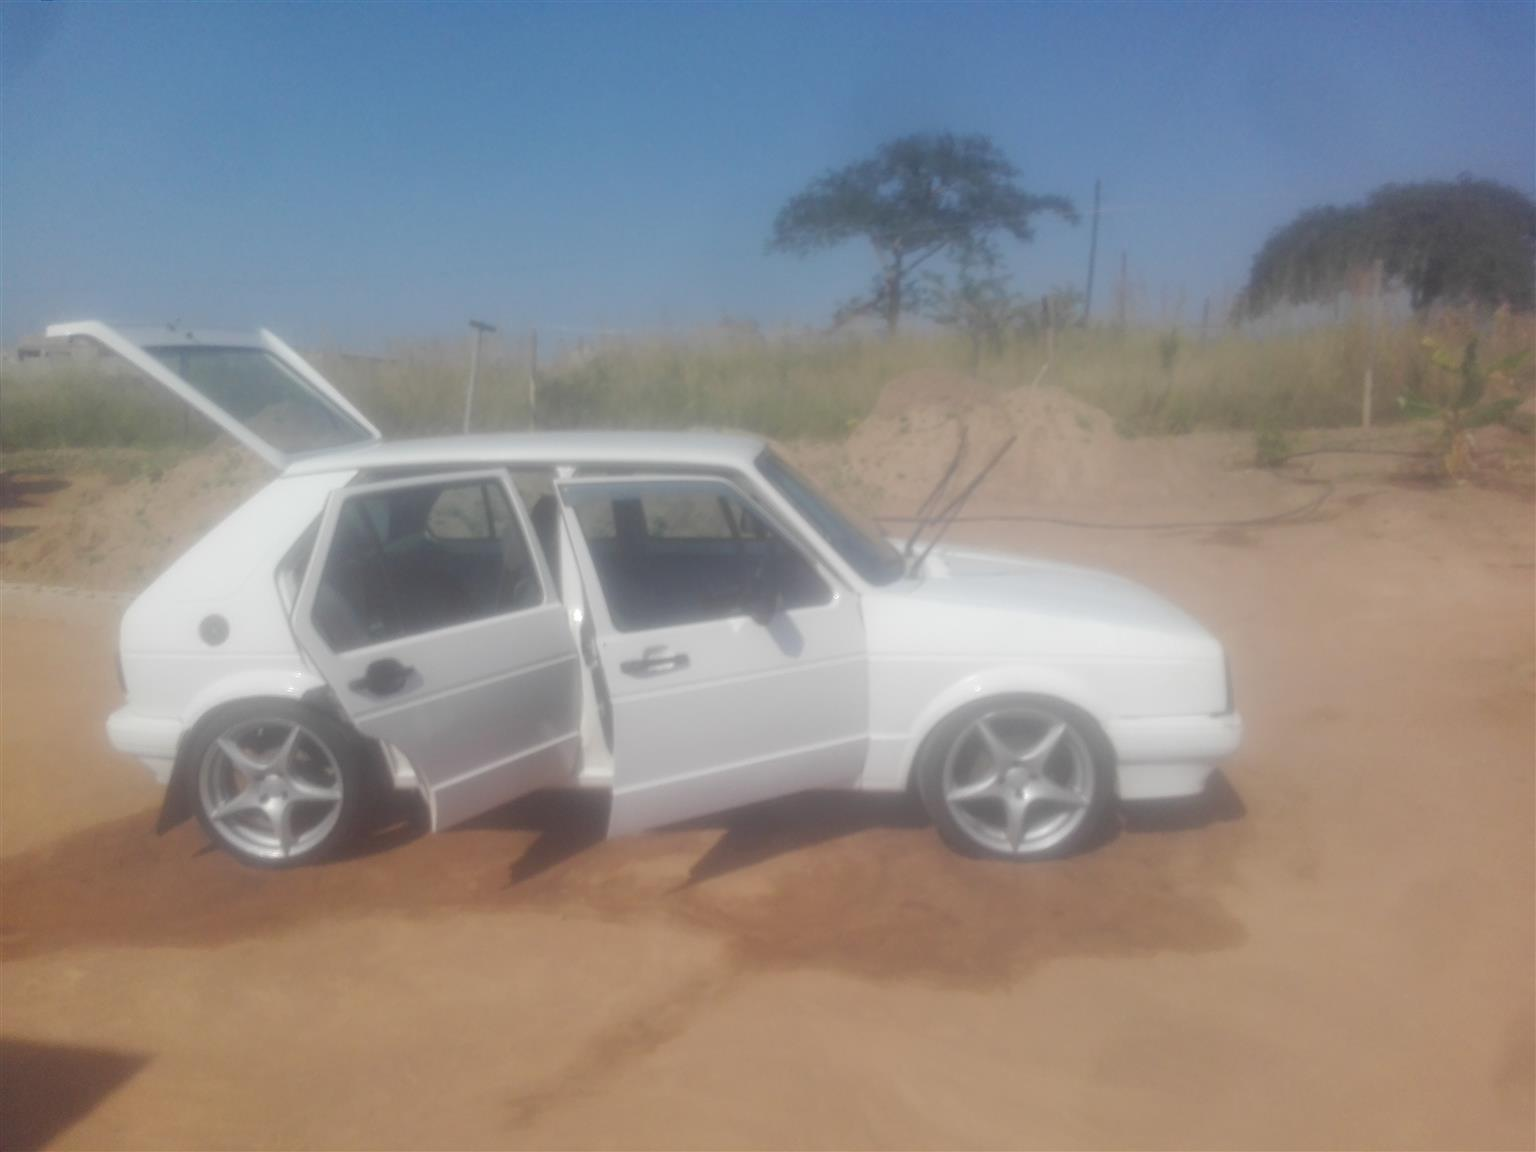 2002 VW Citi CITI 1.4i